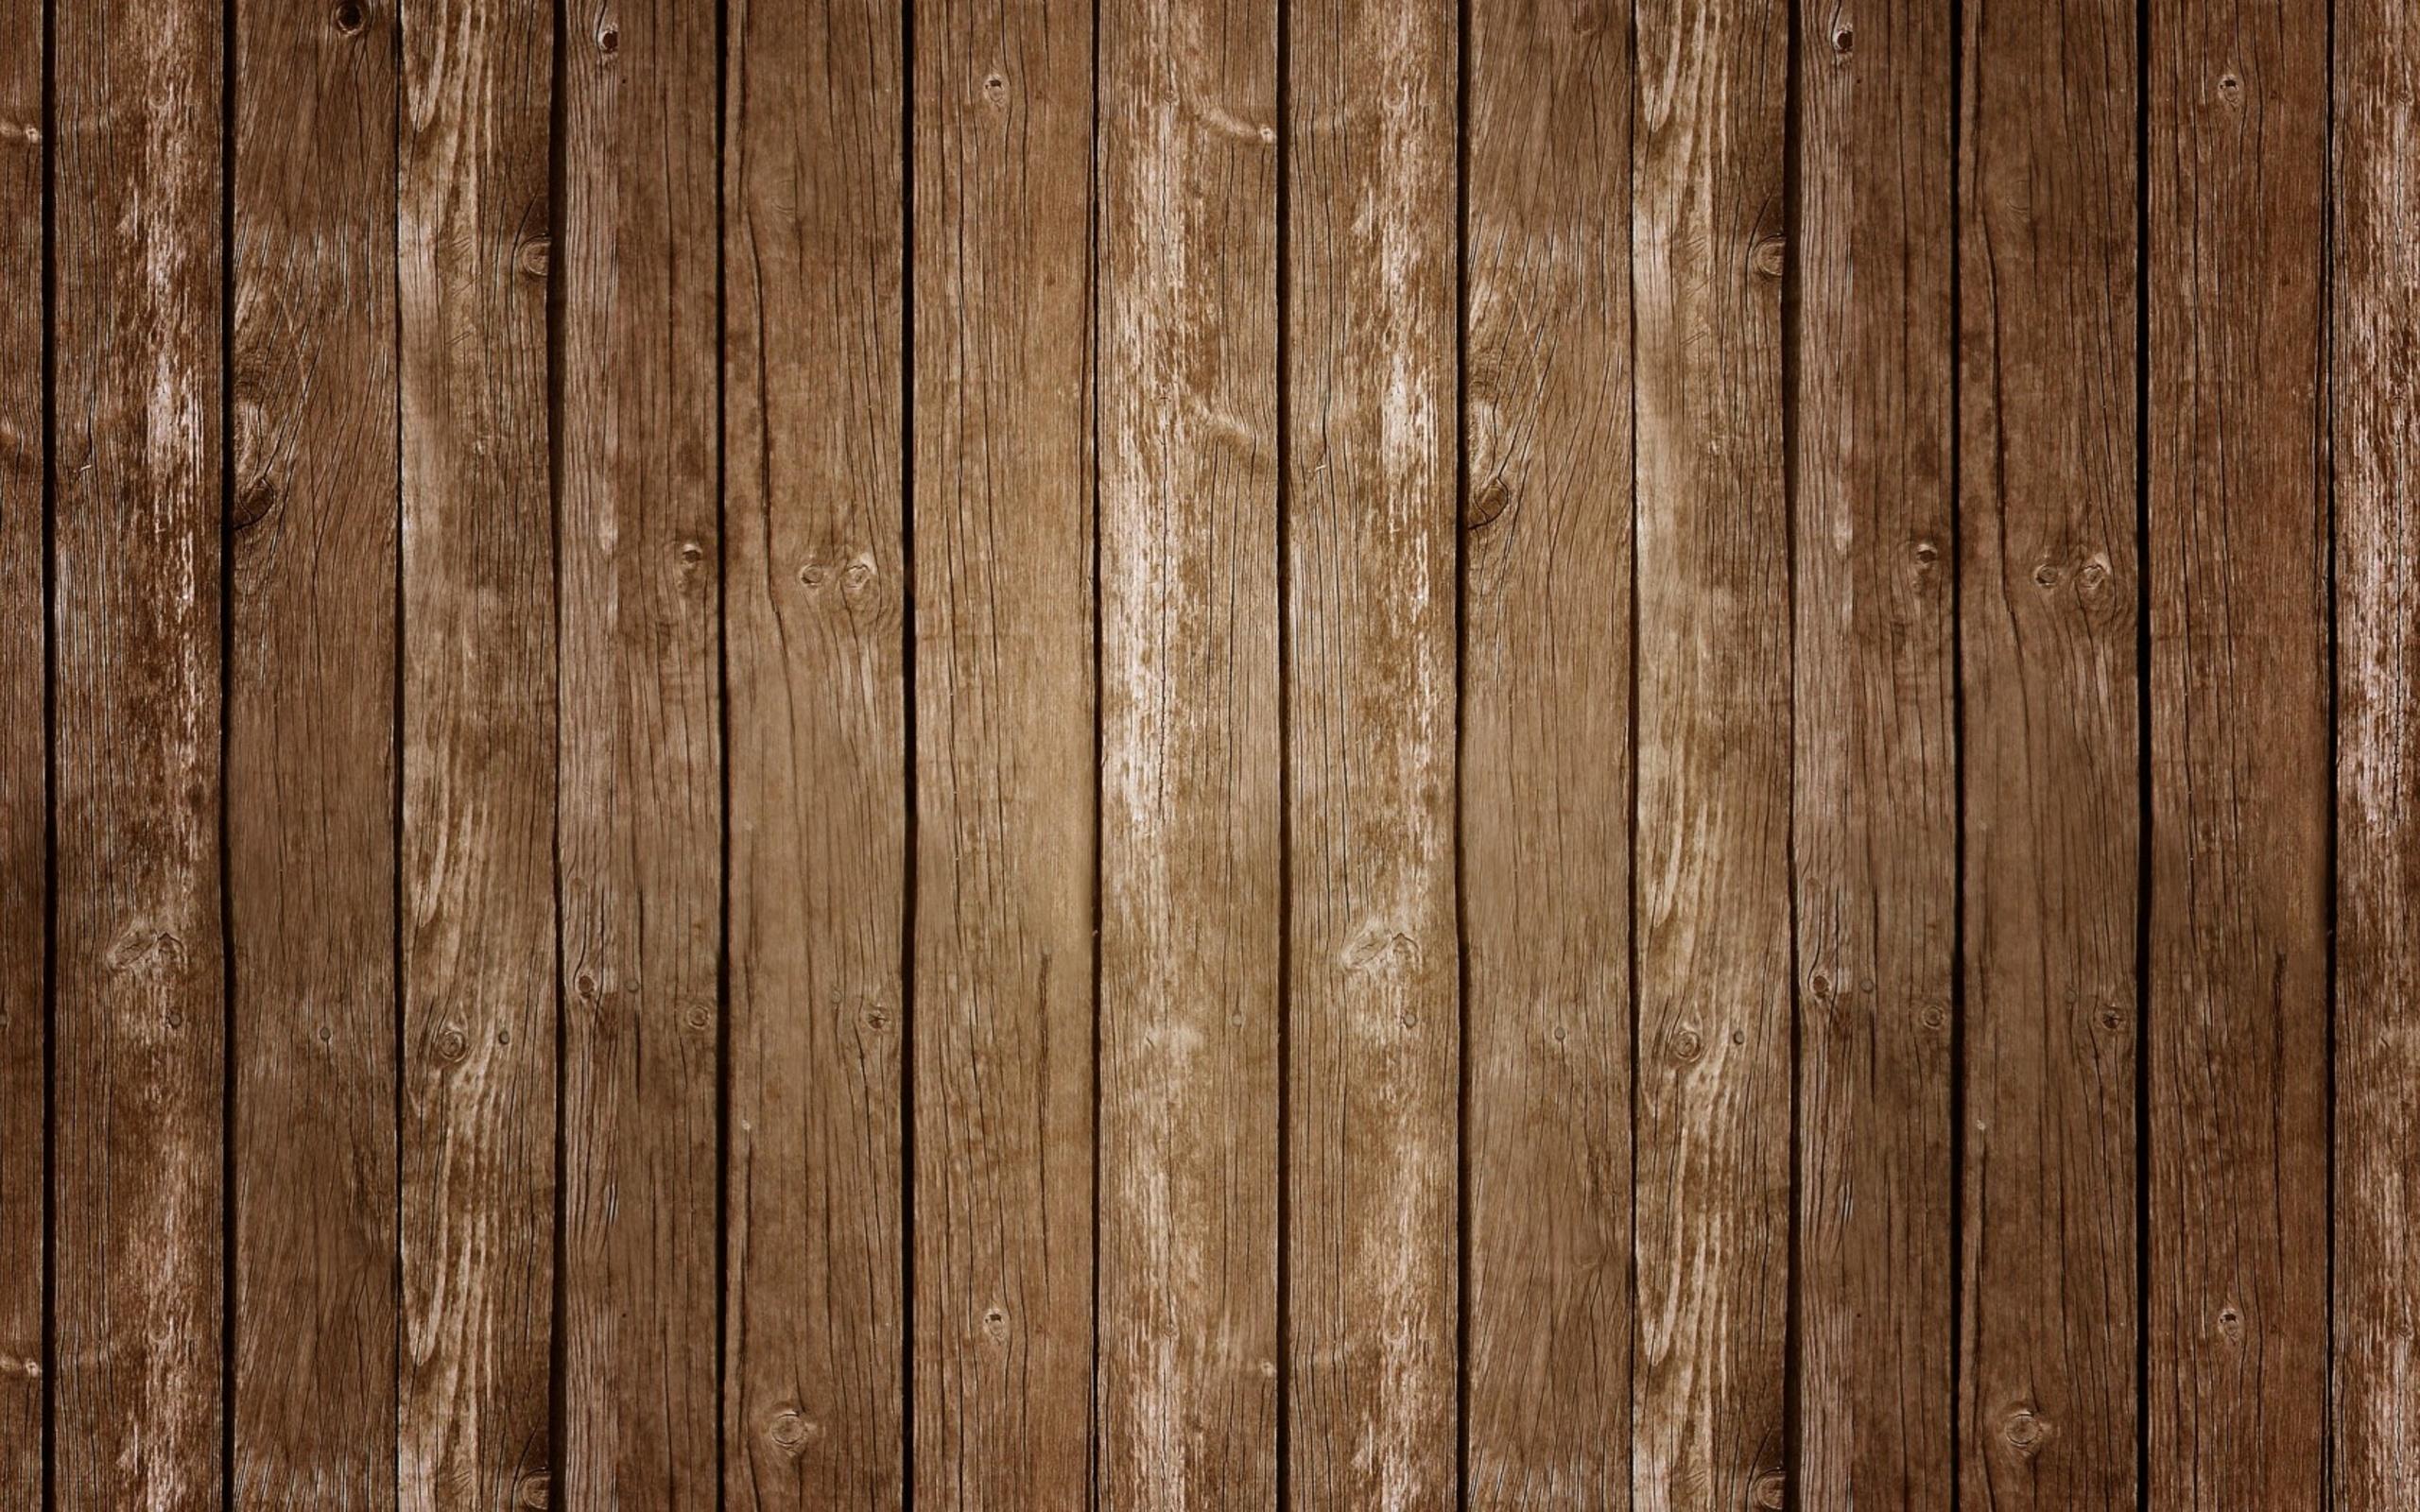 wood wallpaper 3 2560x1600